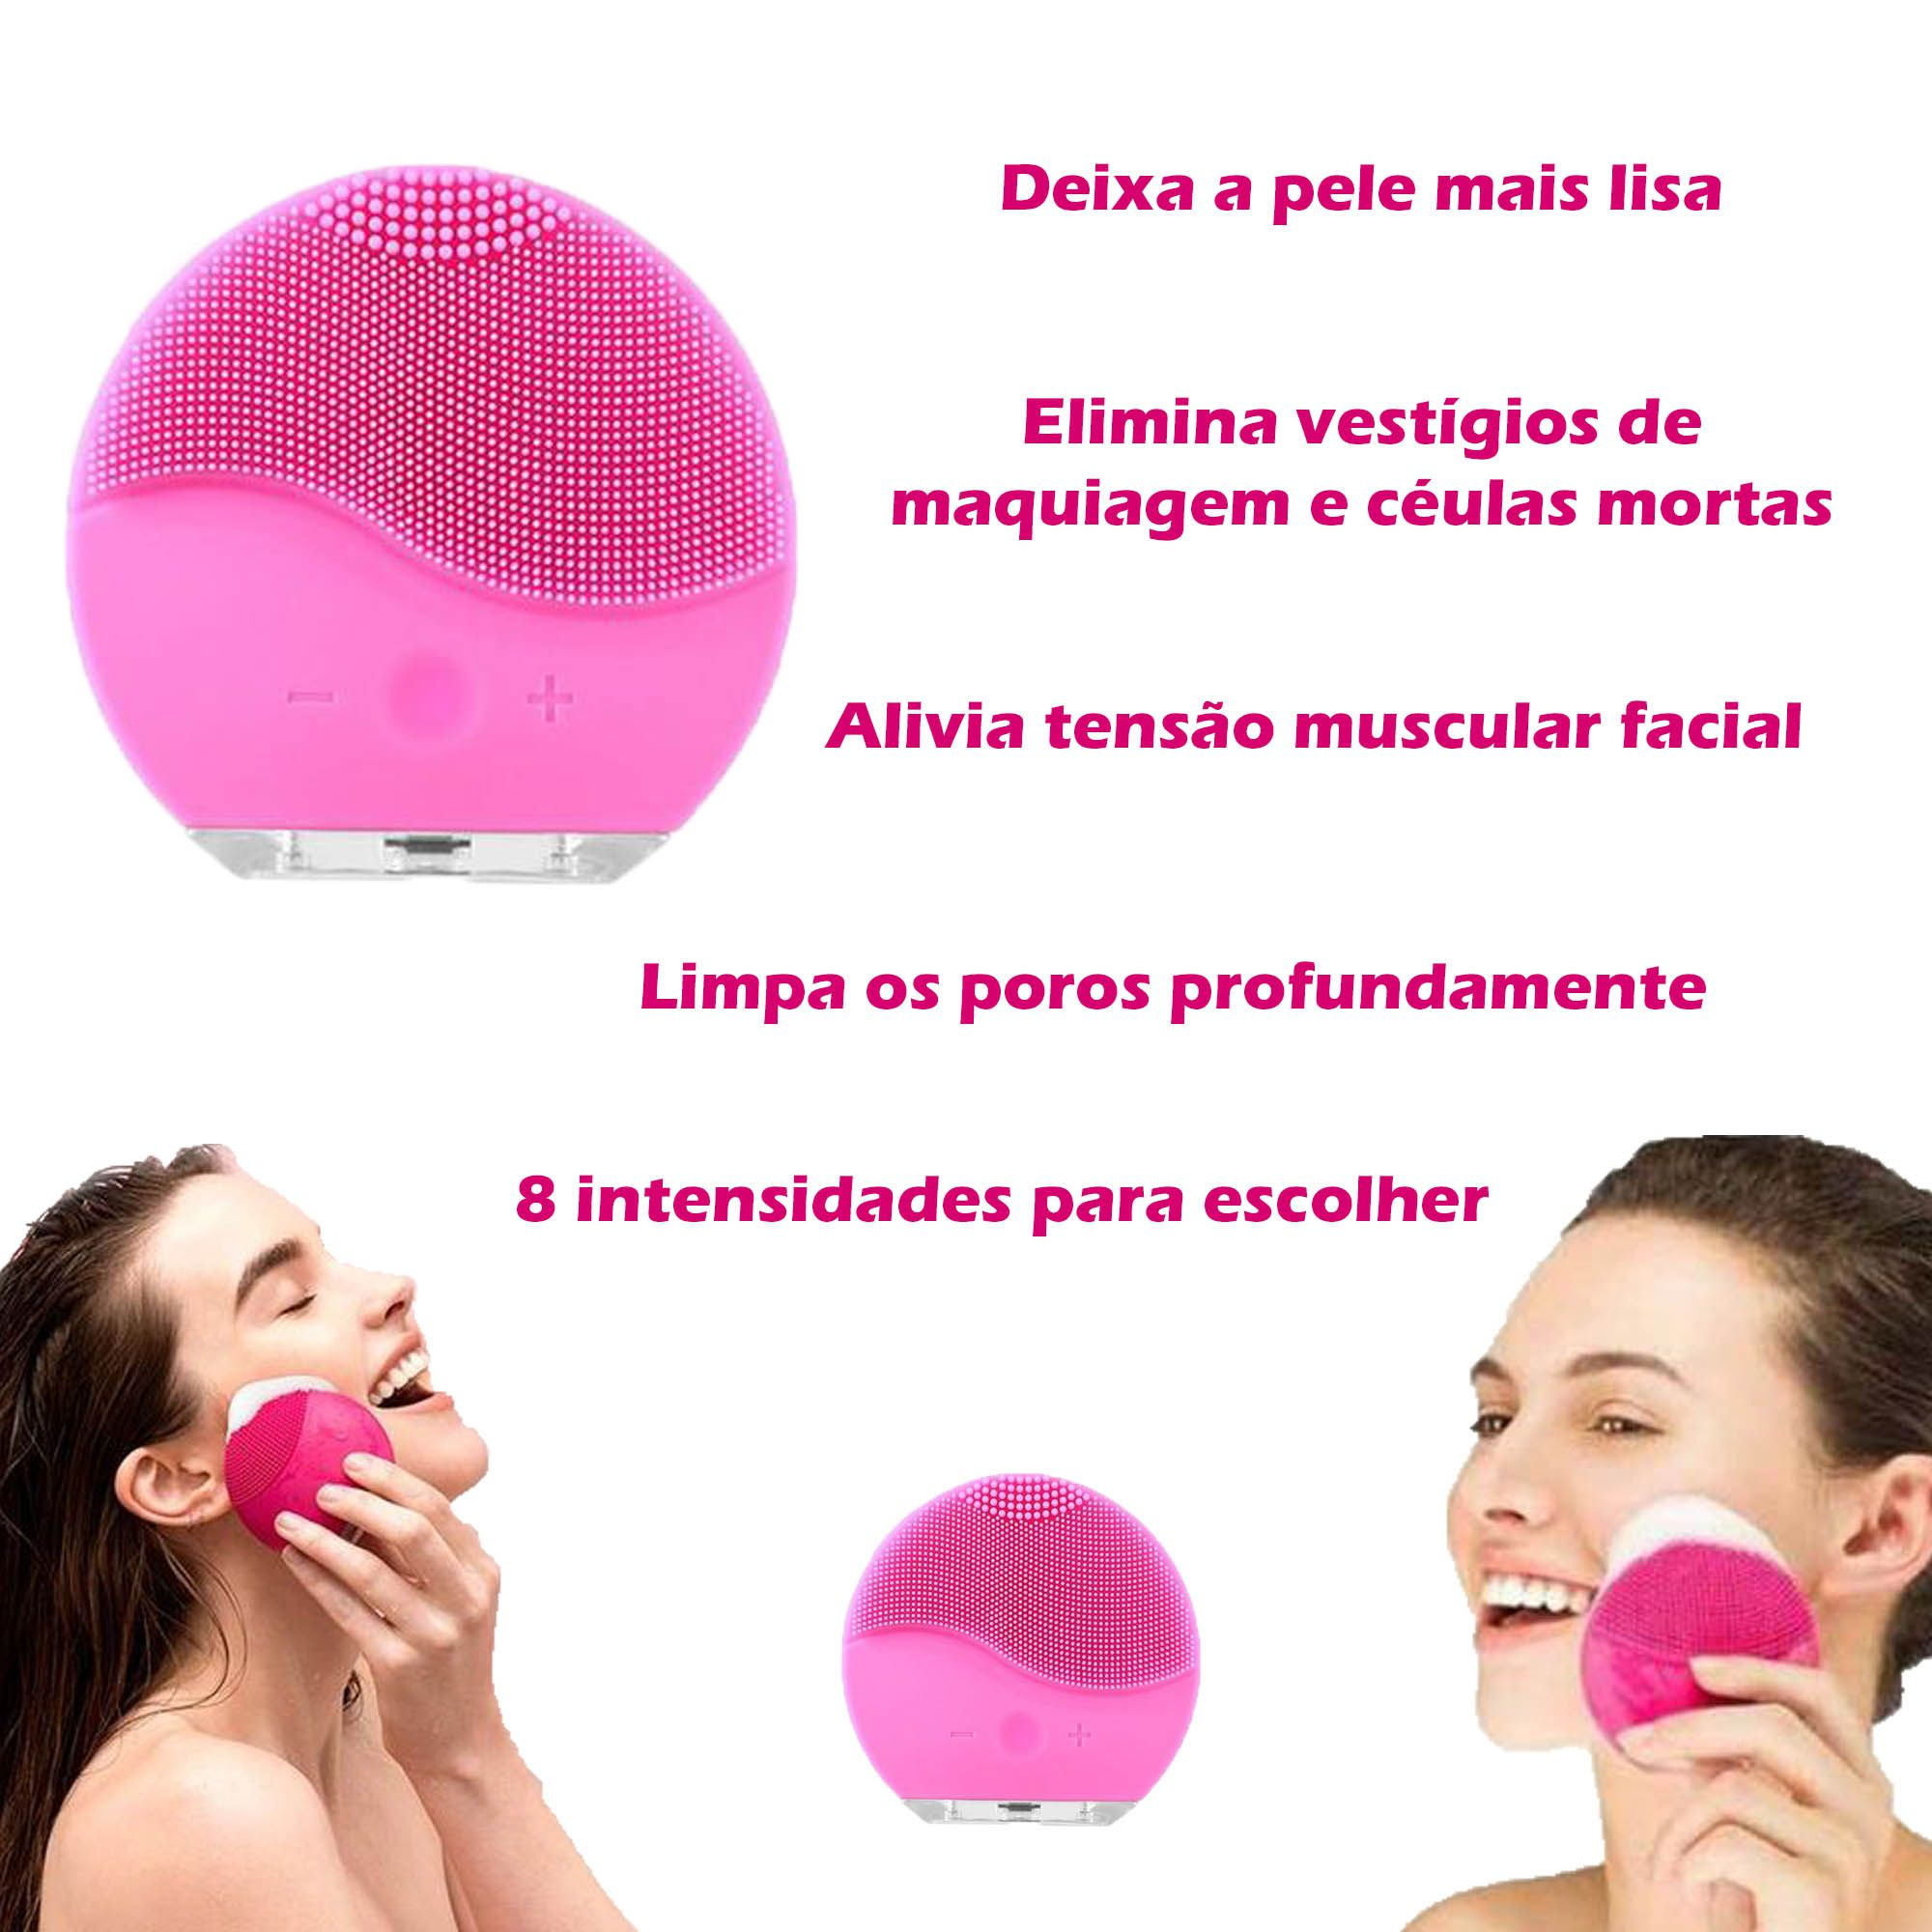 Kit Limpeza Facial - Cuidados com a pele / Heart Of Love